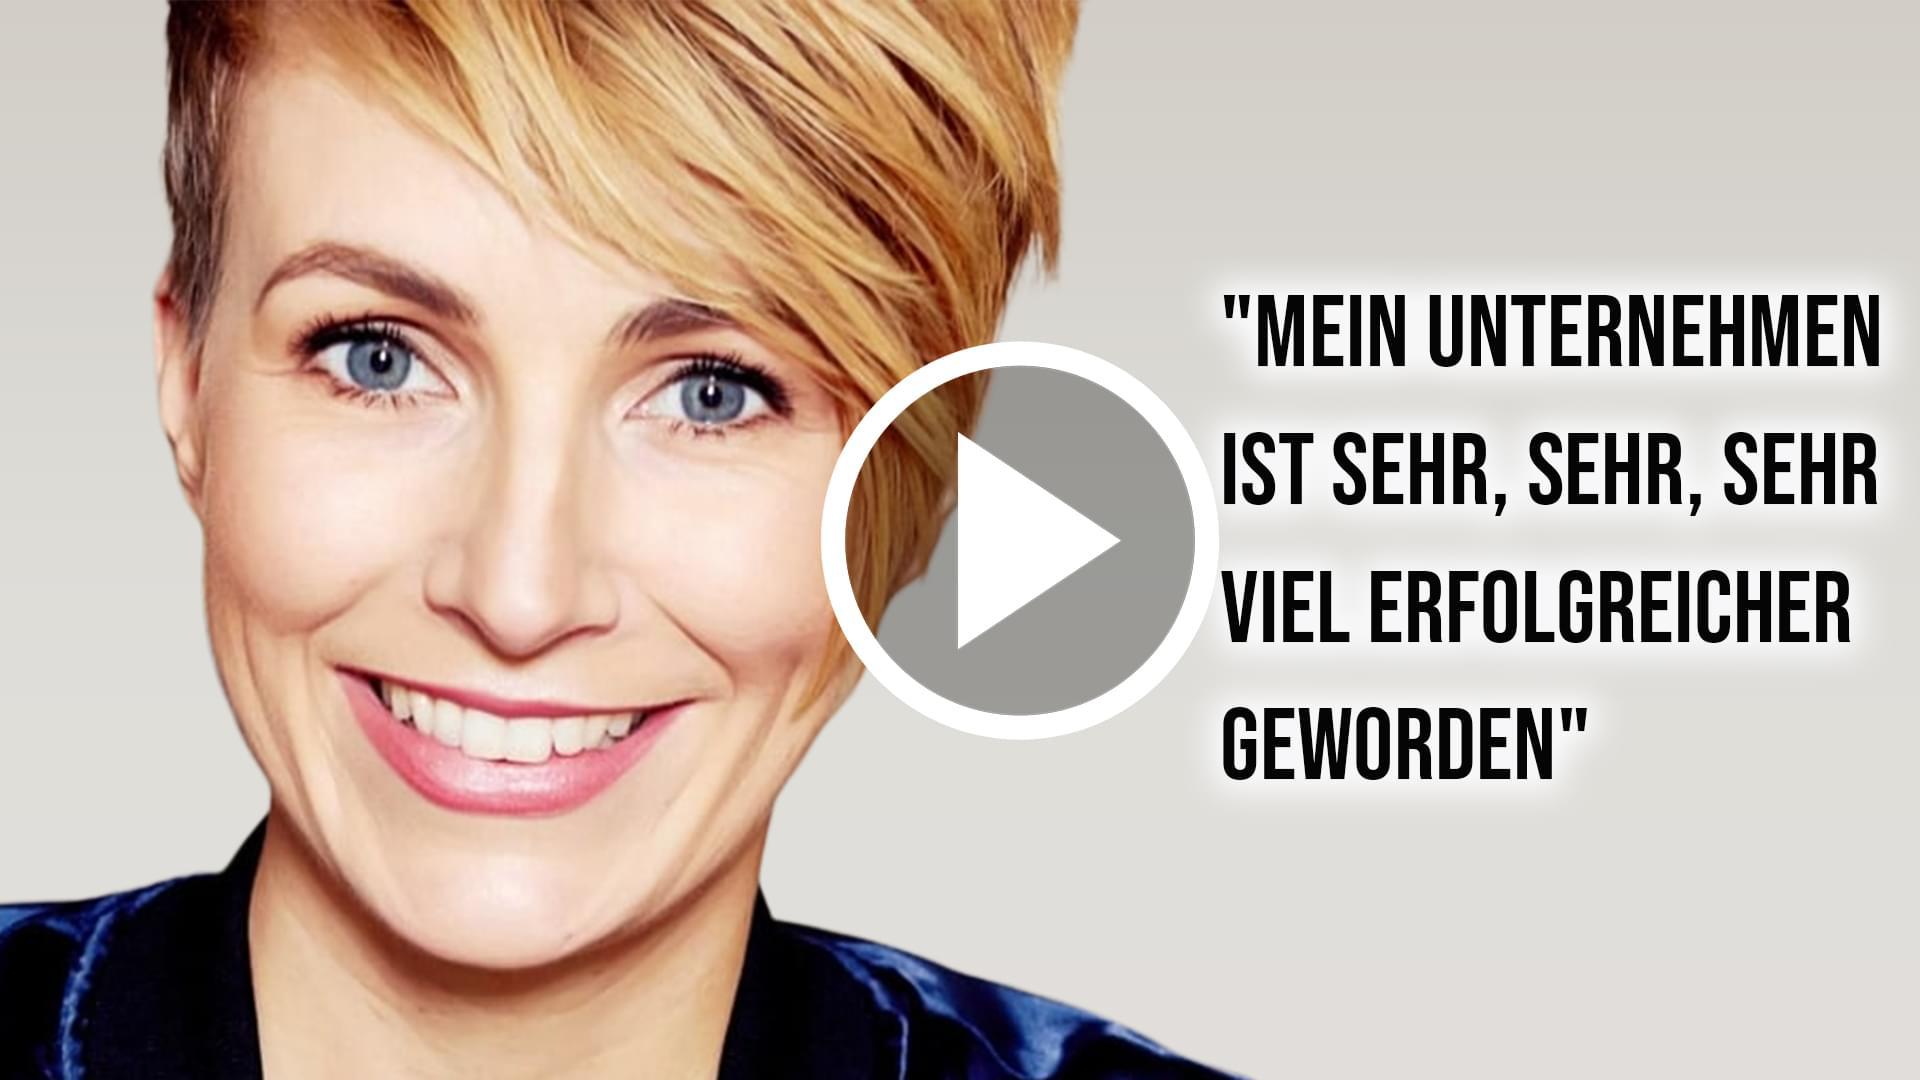 Dominik Bärenthaler Erfahrung - Miriam Jacks